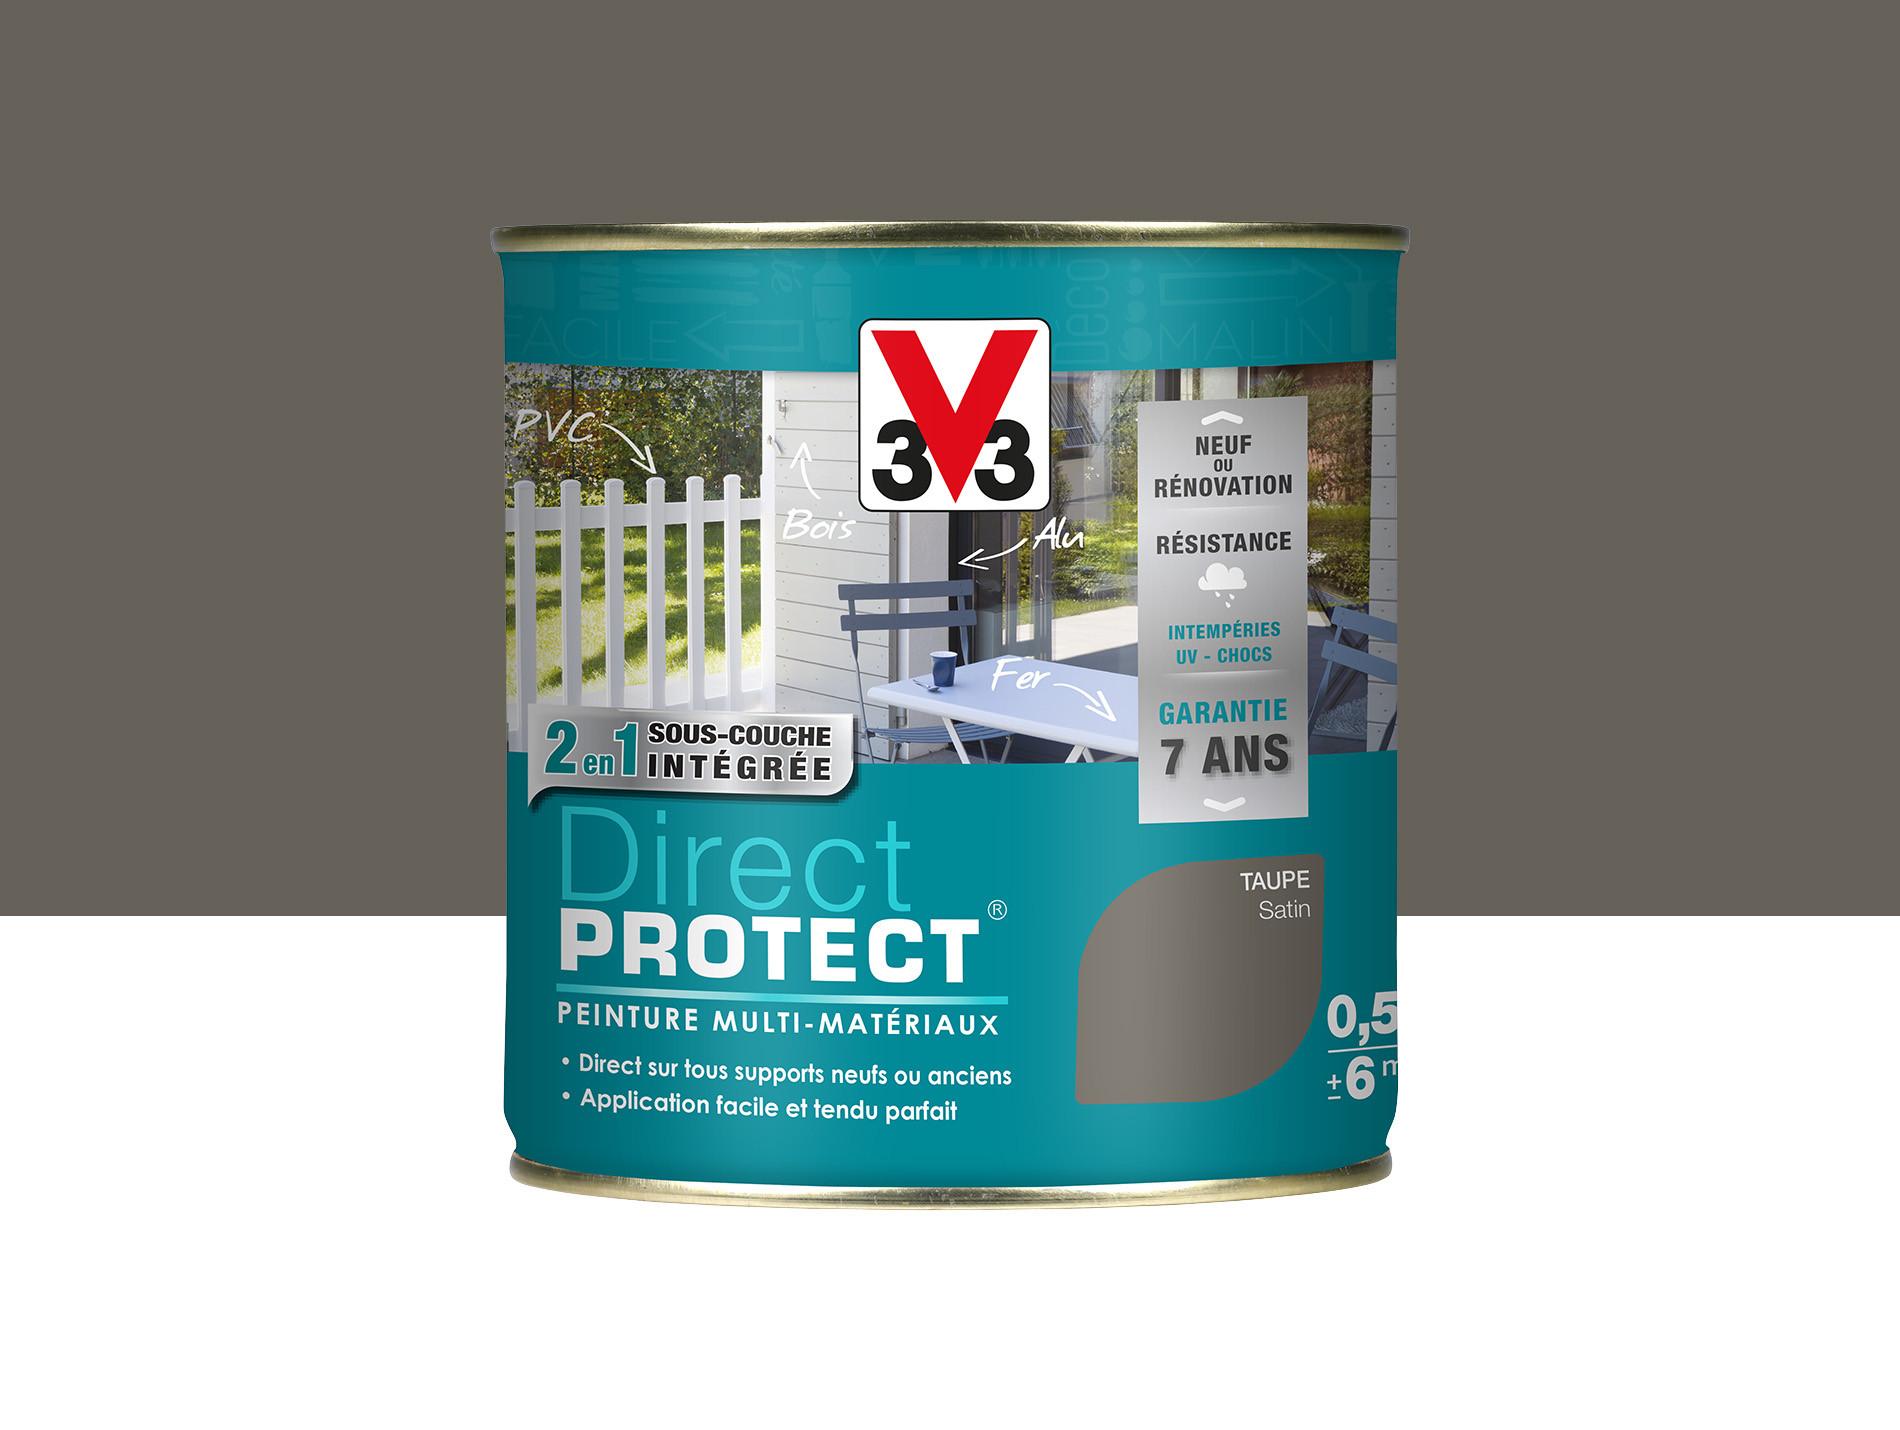 Peinture Direct Protect V33 Satiné Taupe 500ml